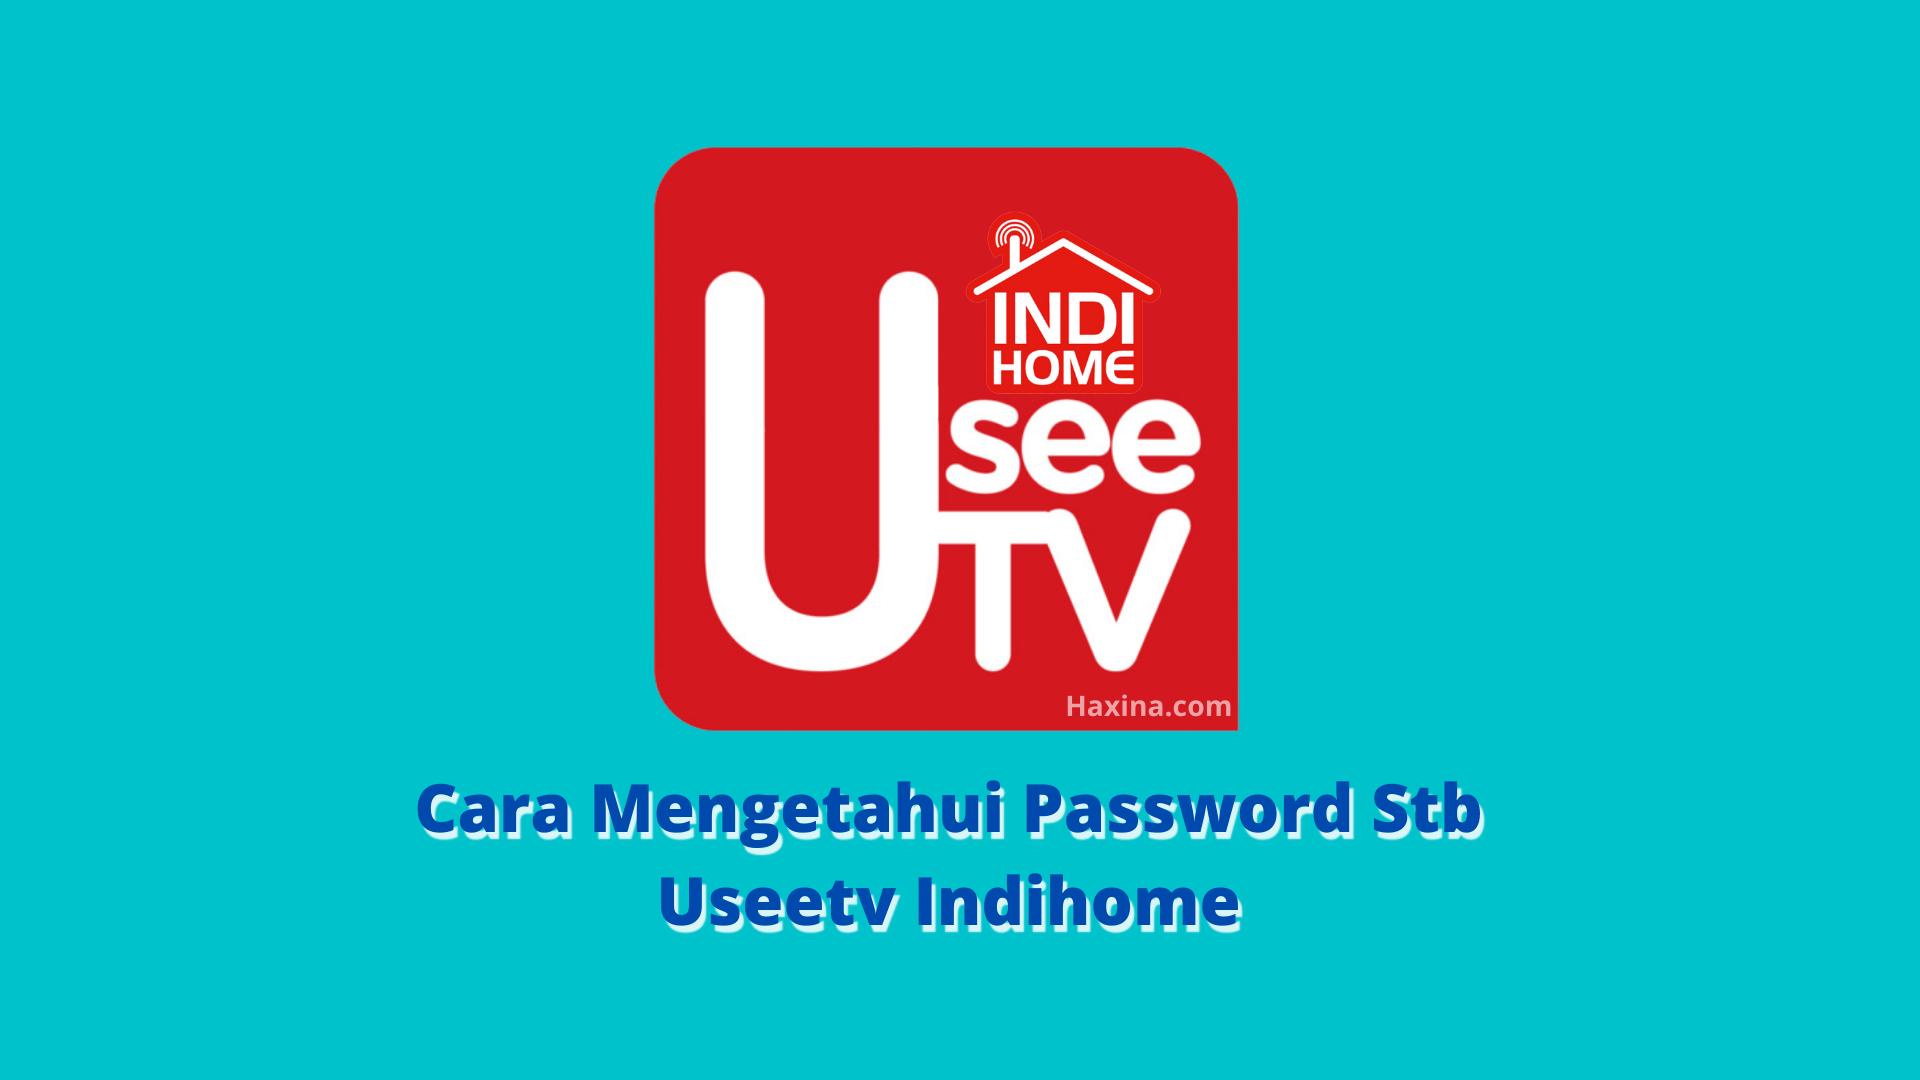 Cara Mengetahui Password Stb Useetv Indihome